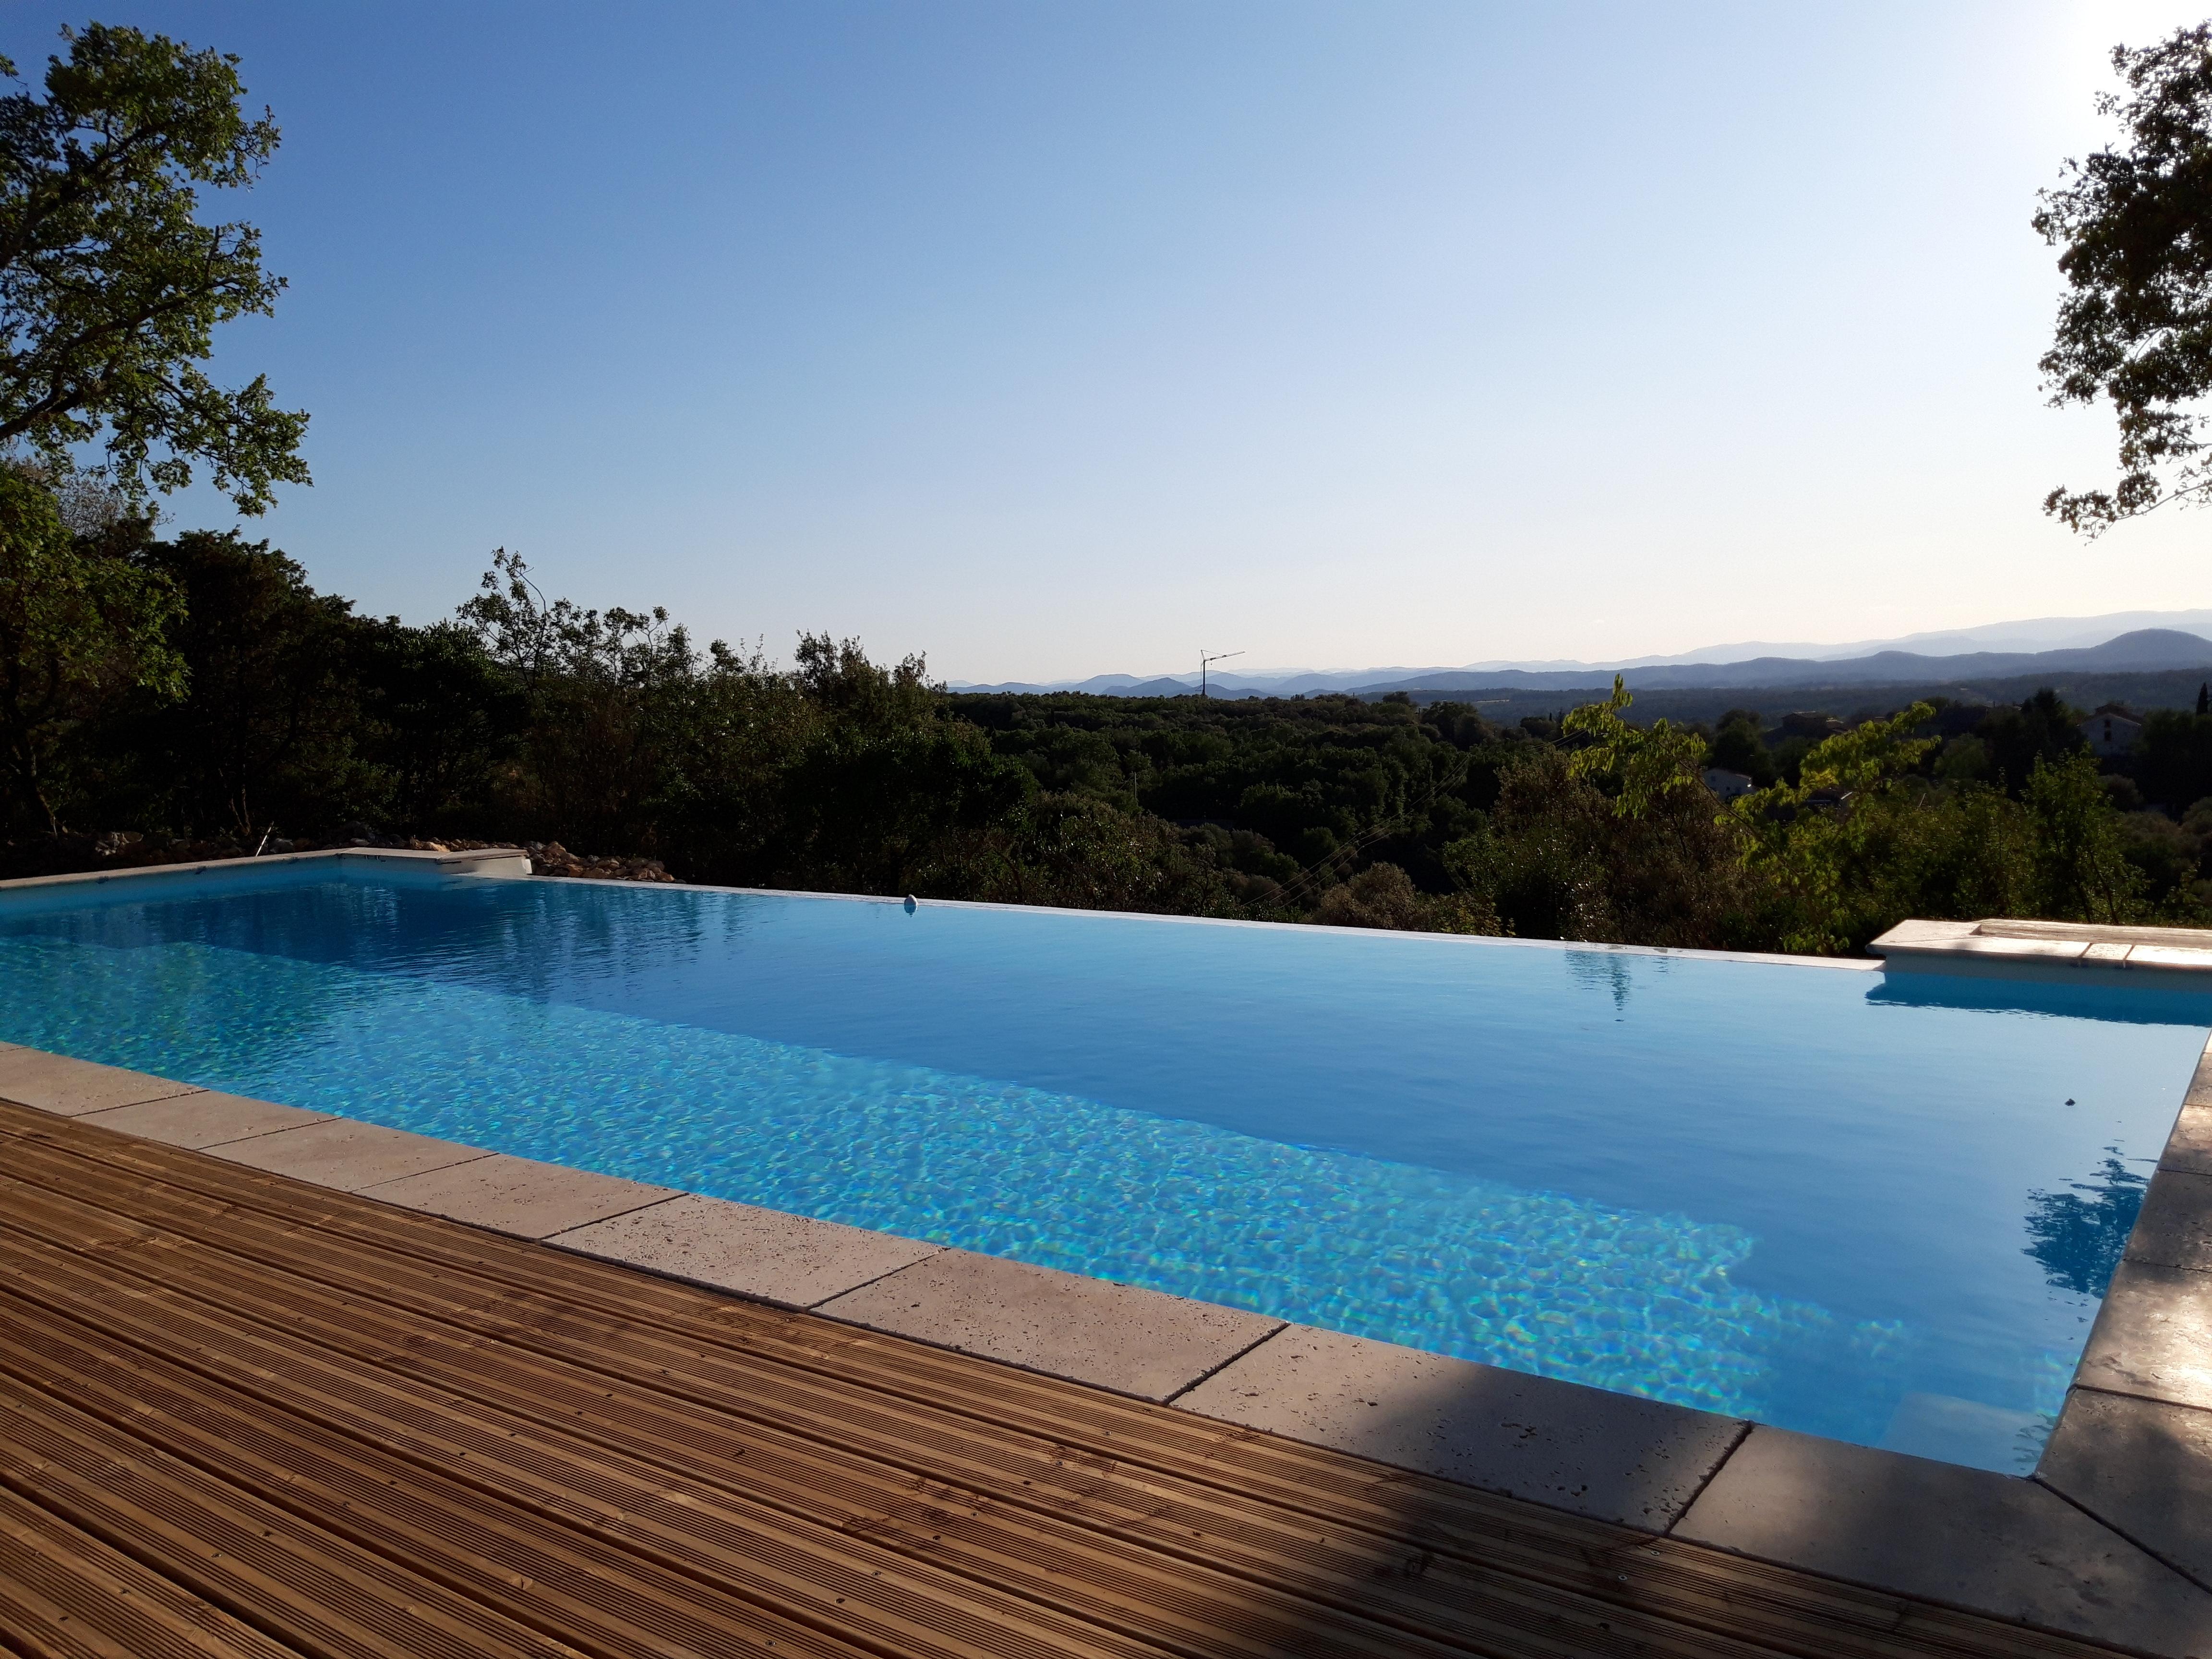 Terrasse bois pîscine (7)